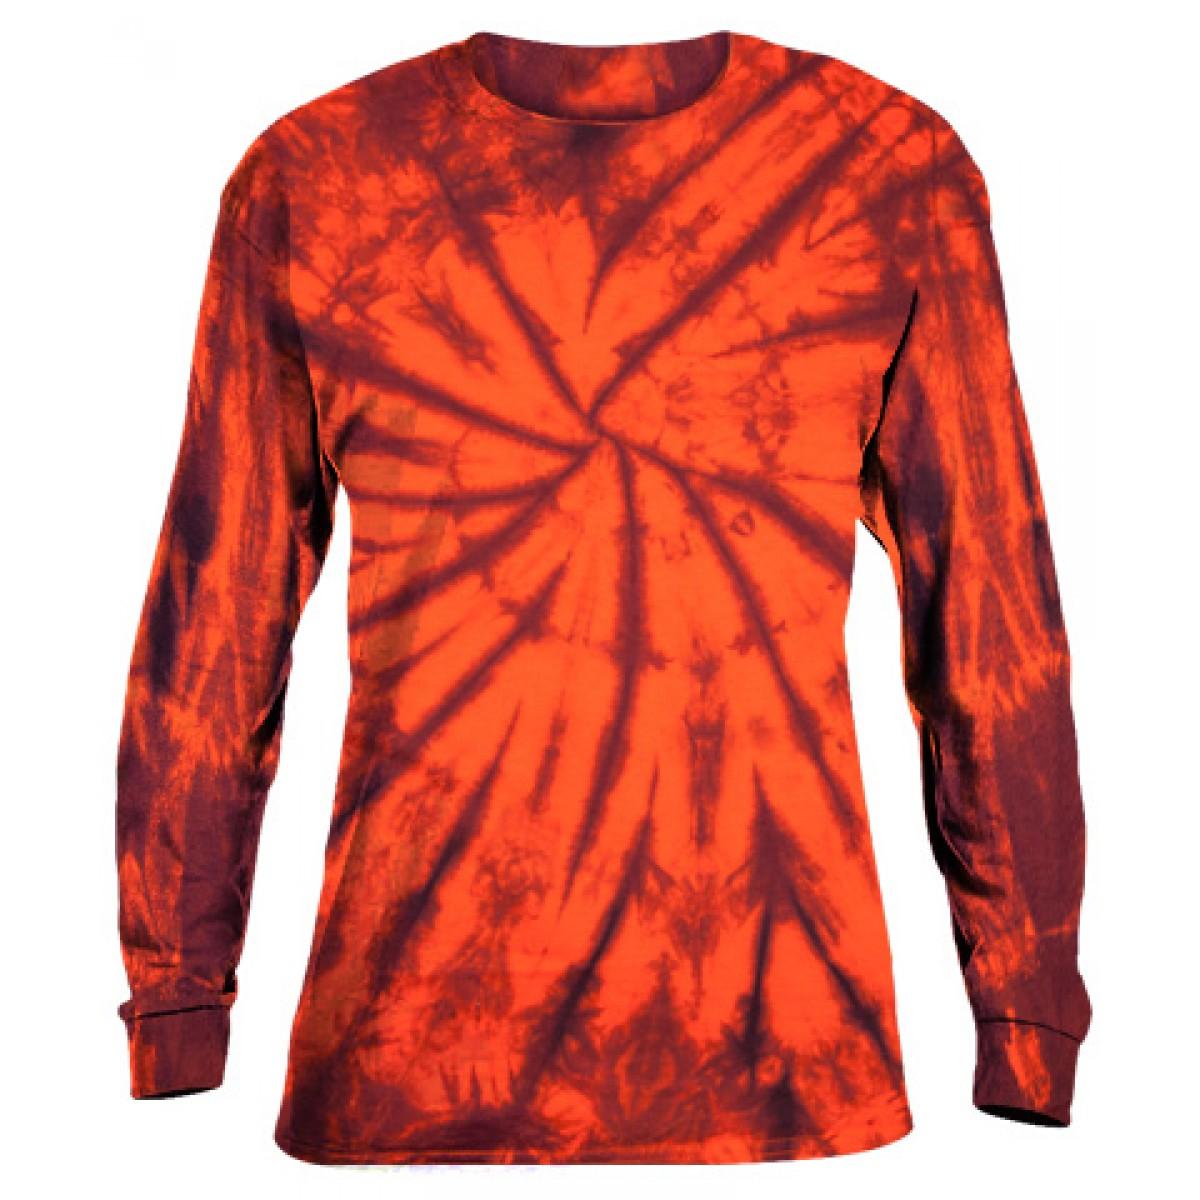 Tie-Dye Long Sleeve Shirt